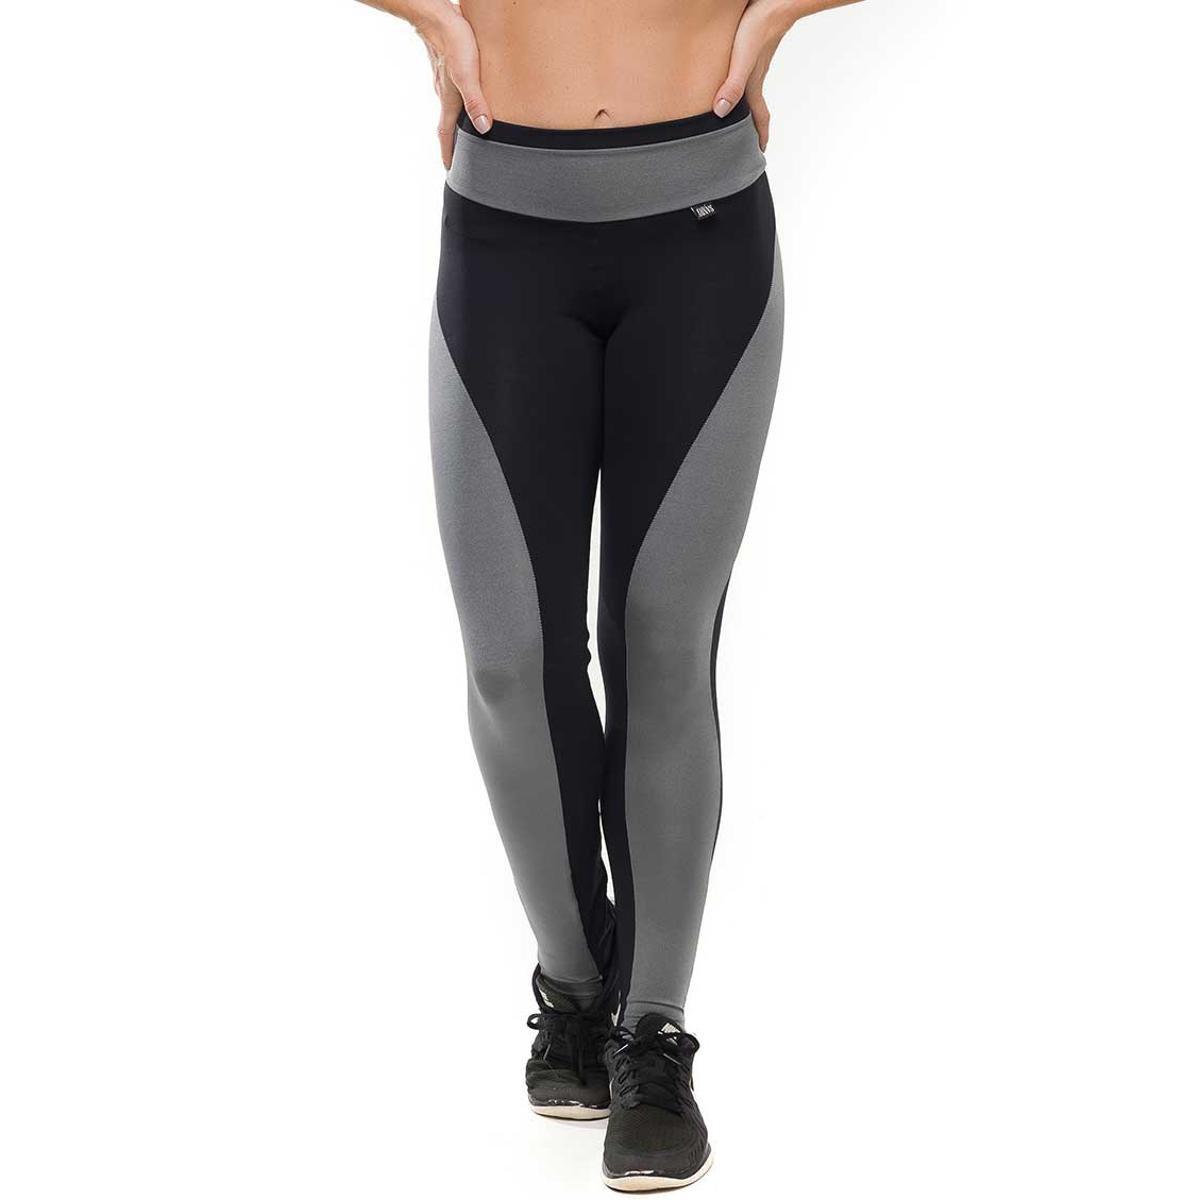 Sandy Prata Legging Preto Fitness Premium Legging Premium e R1Wtqw0z8P